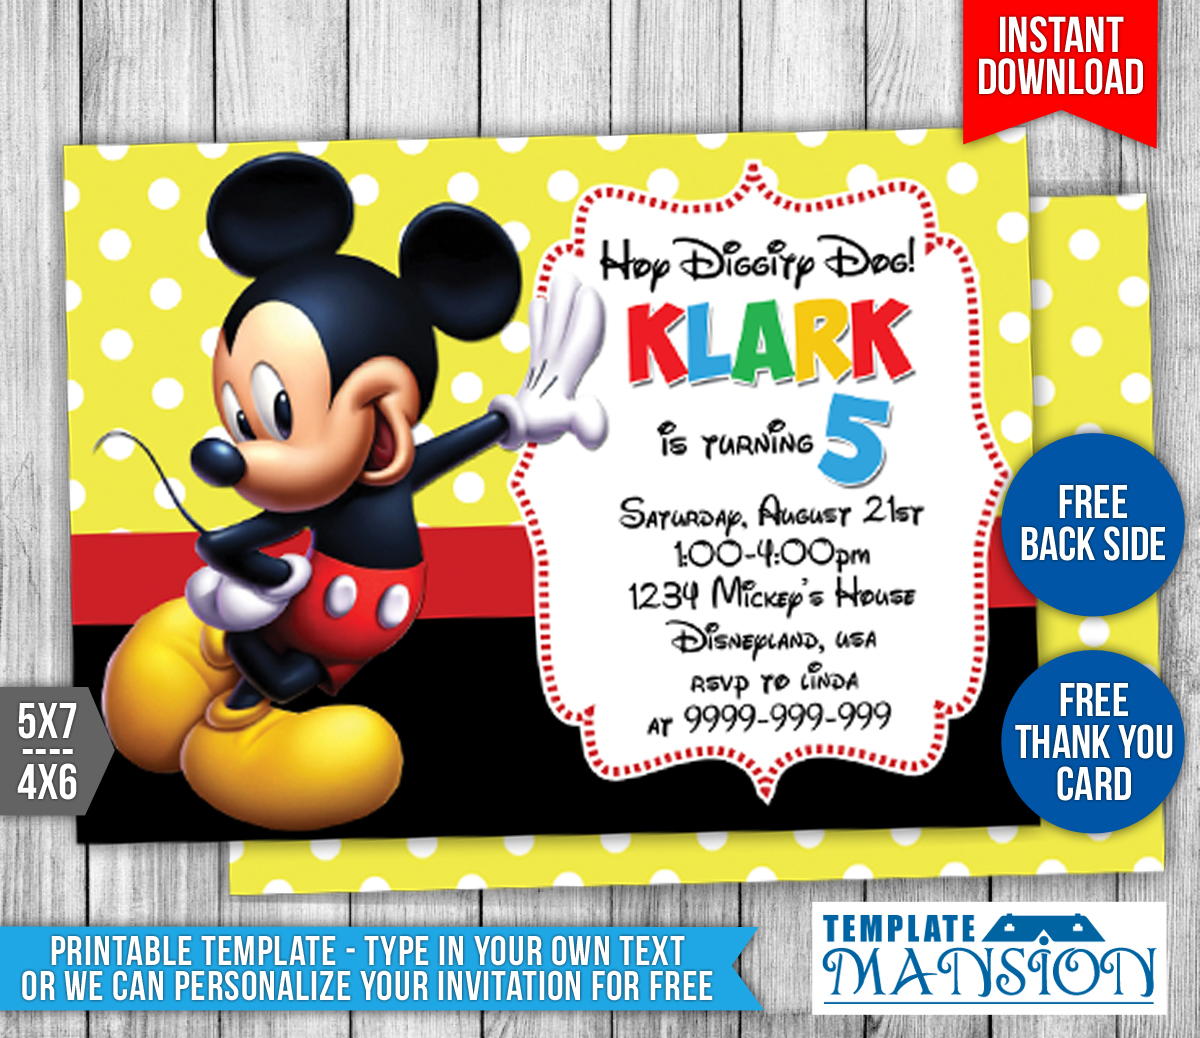 Mickey mouse birthday invitation 2 by templatemansion on deviantart mickey mouse birthday invitation 2 by templatemansion stopboris Choice Image